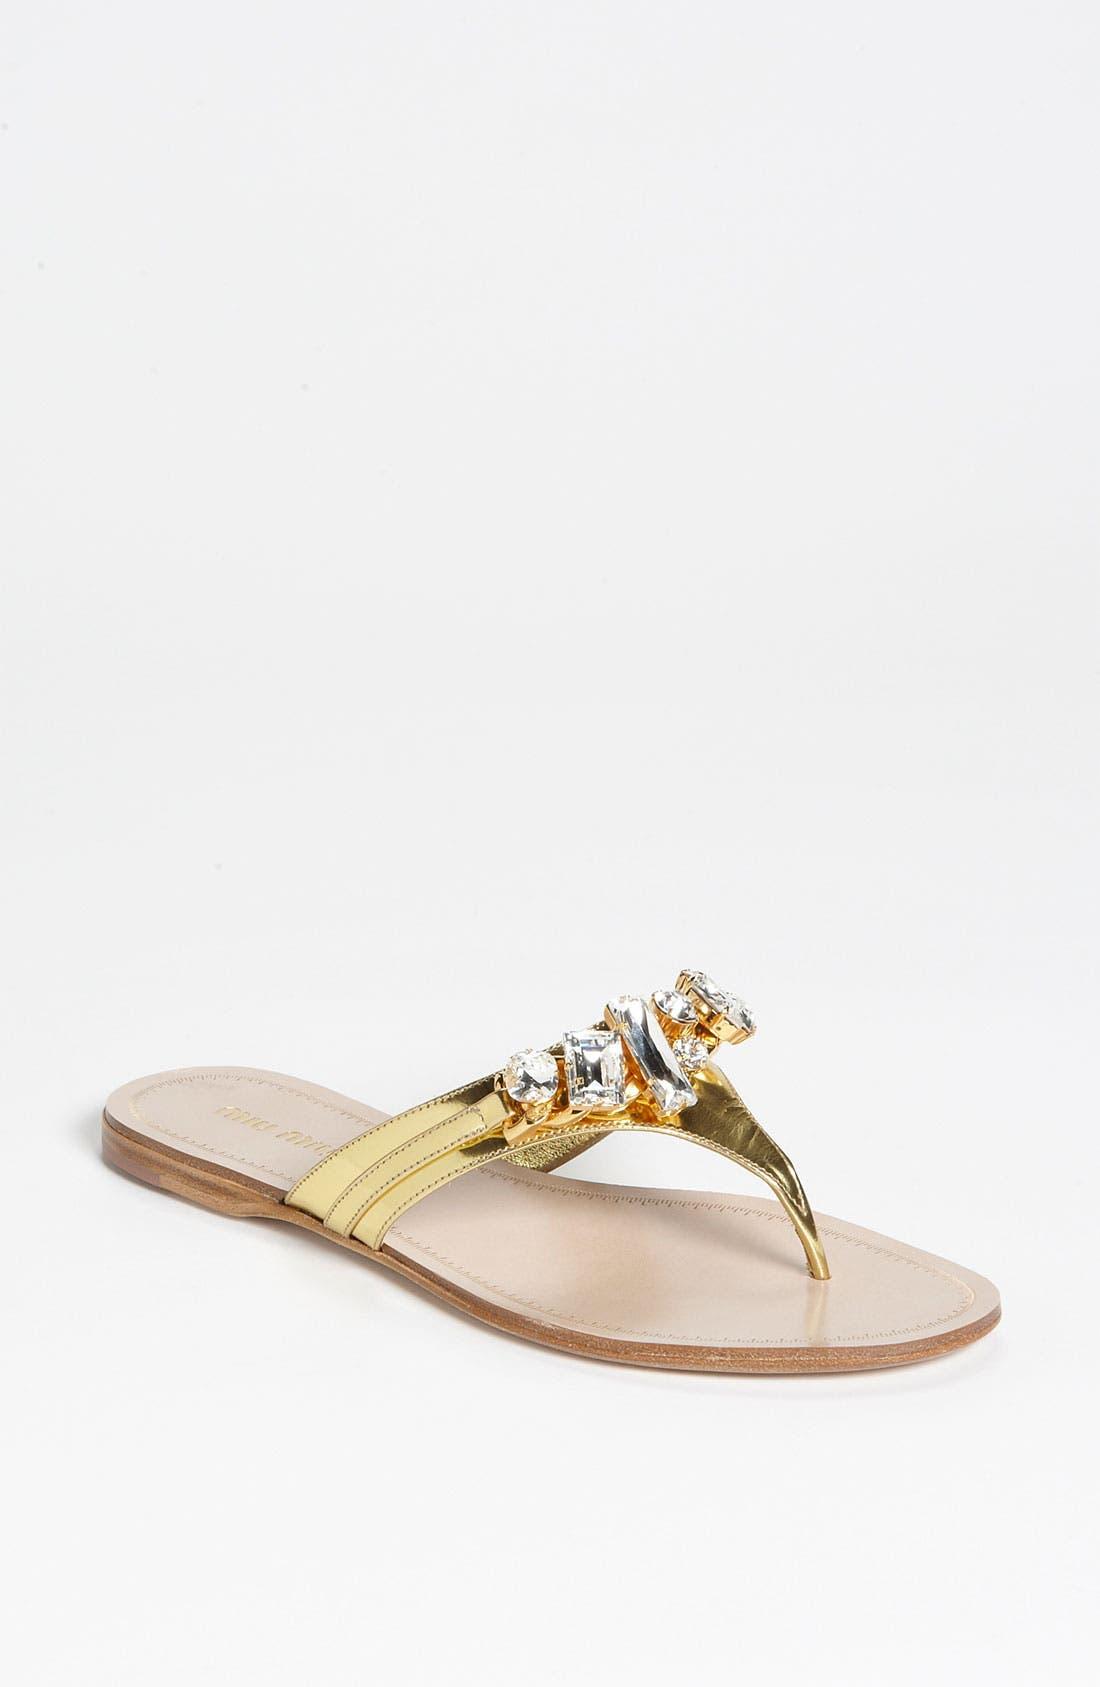 Alternate Image 1 Selected - Miu Miu Jeweled Thong Sandal